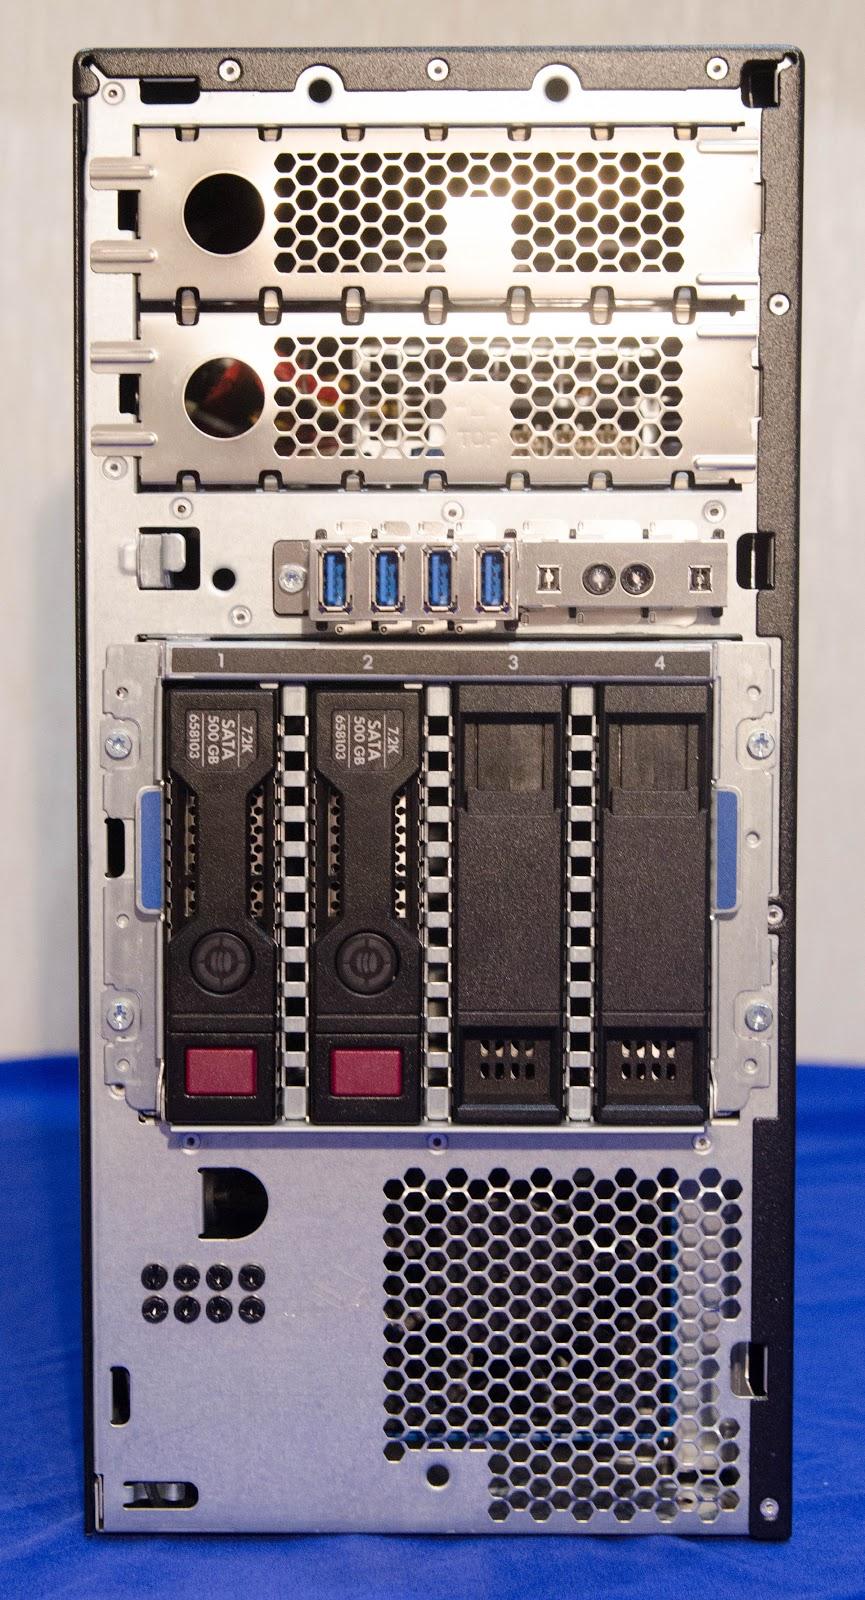 MаL, да удал: Обзор младших серверов линейки HPE ProLiant ML - 6